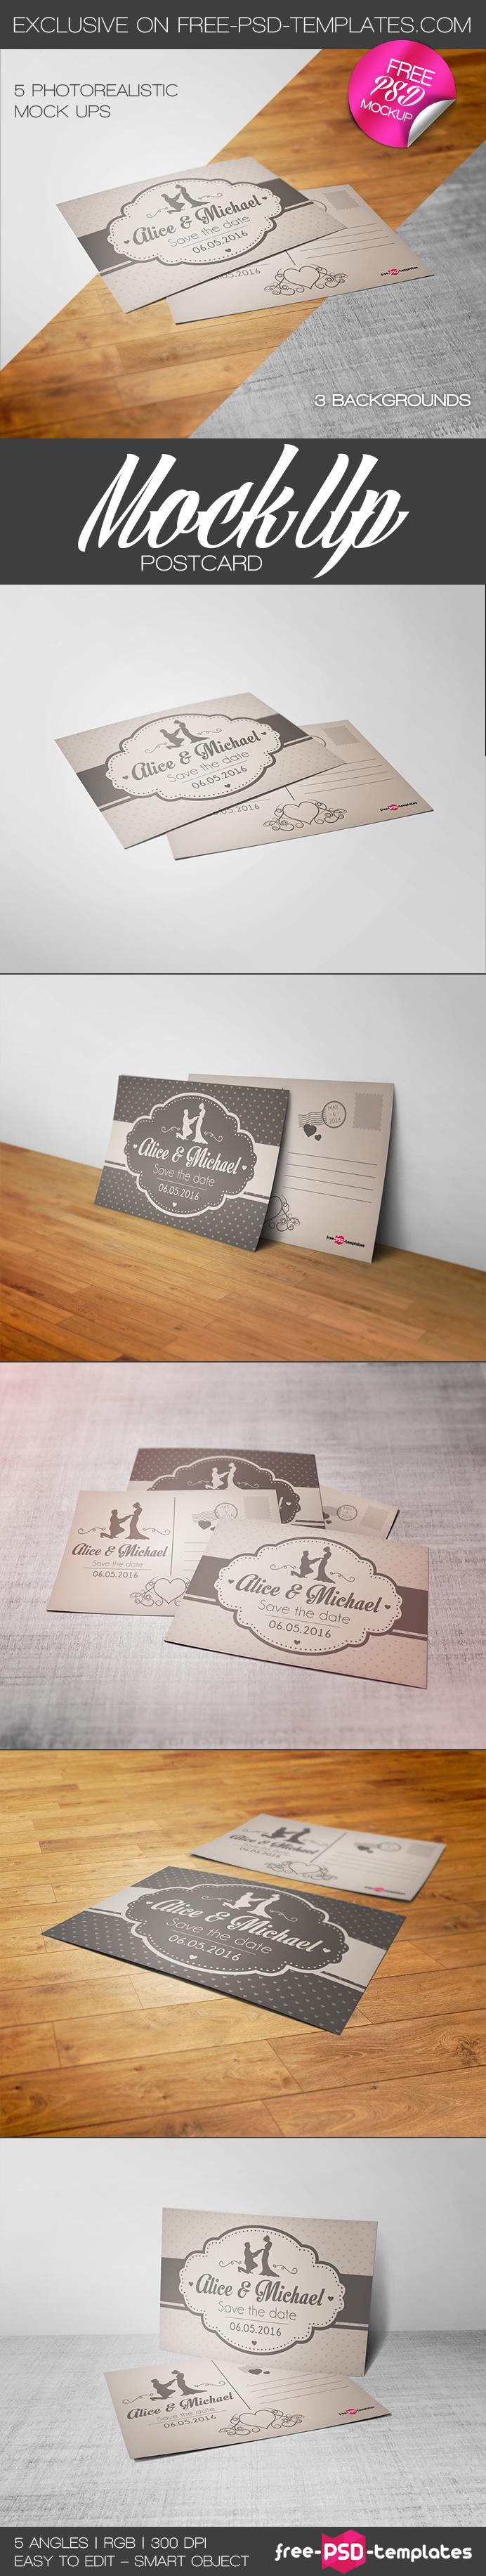 Free 5 Postcard Mockups (244 MB) | free-psd-templates.com | #free #photoshop #mockup